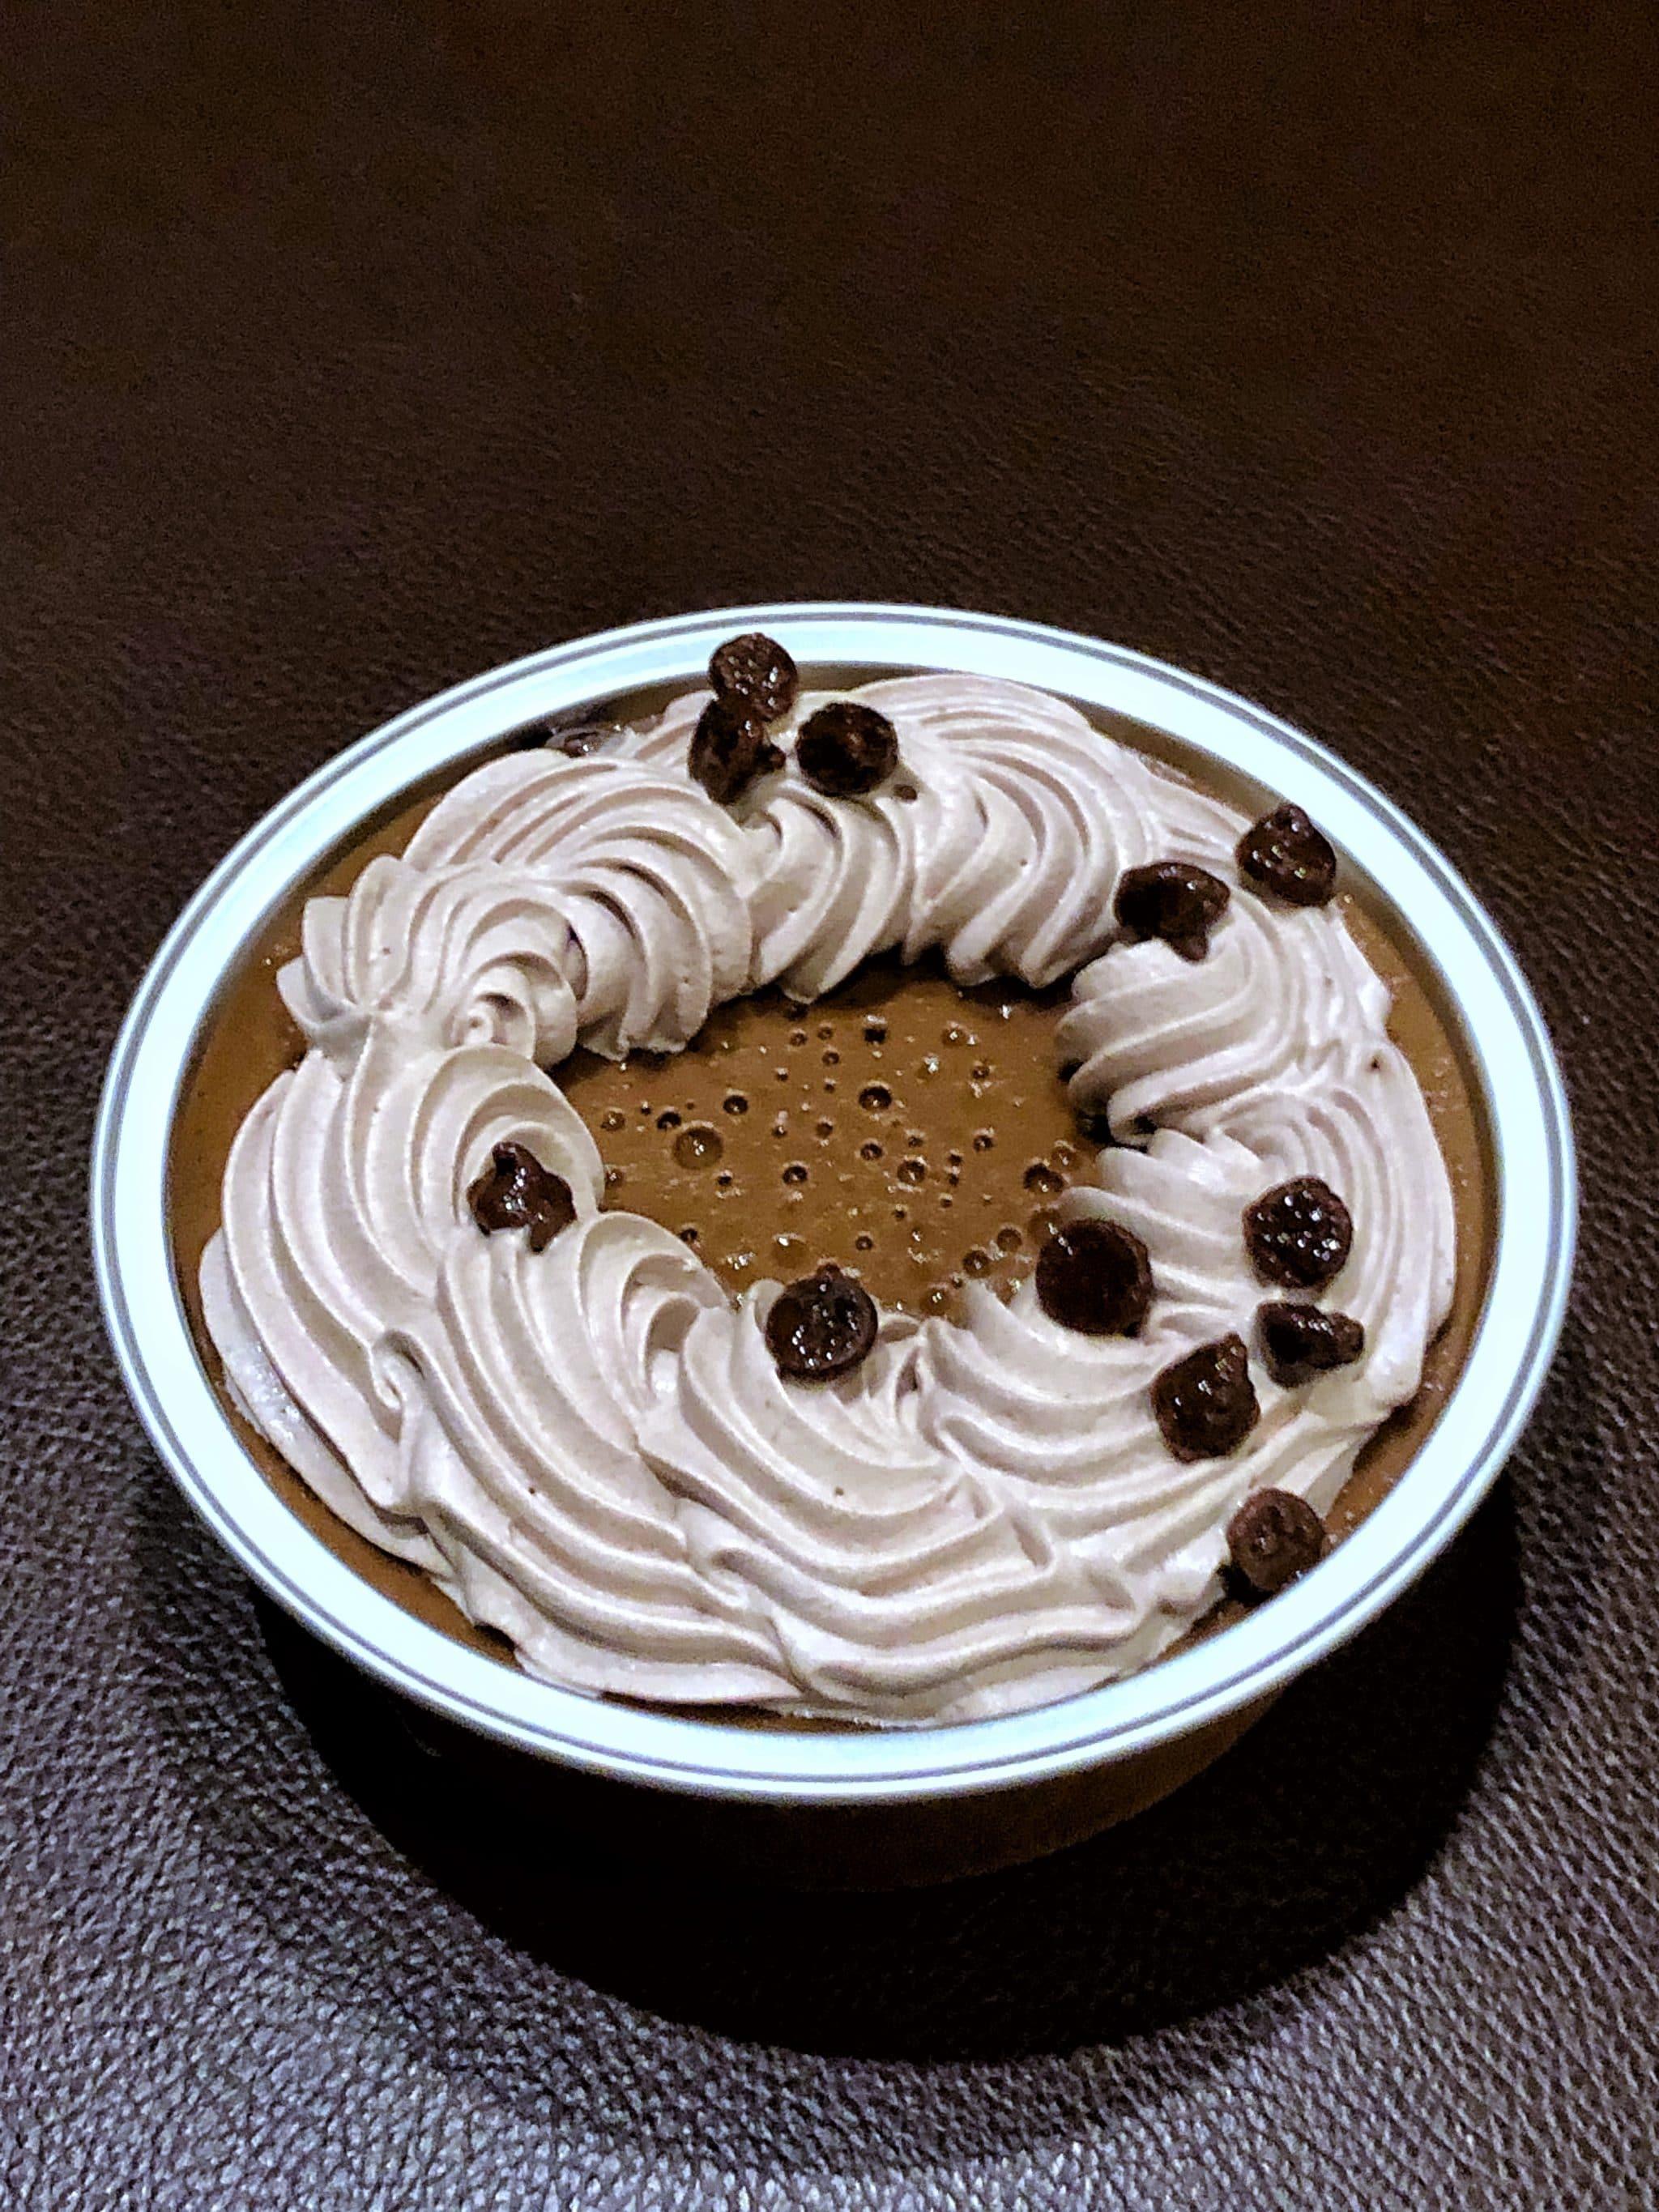 Vegan Chocolate Coconut Pot de Creme Dessert at Disney's Grand Floridian Resort